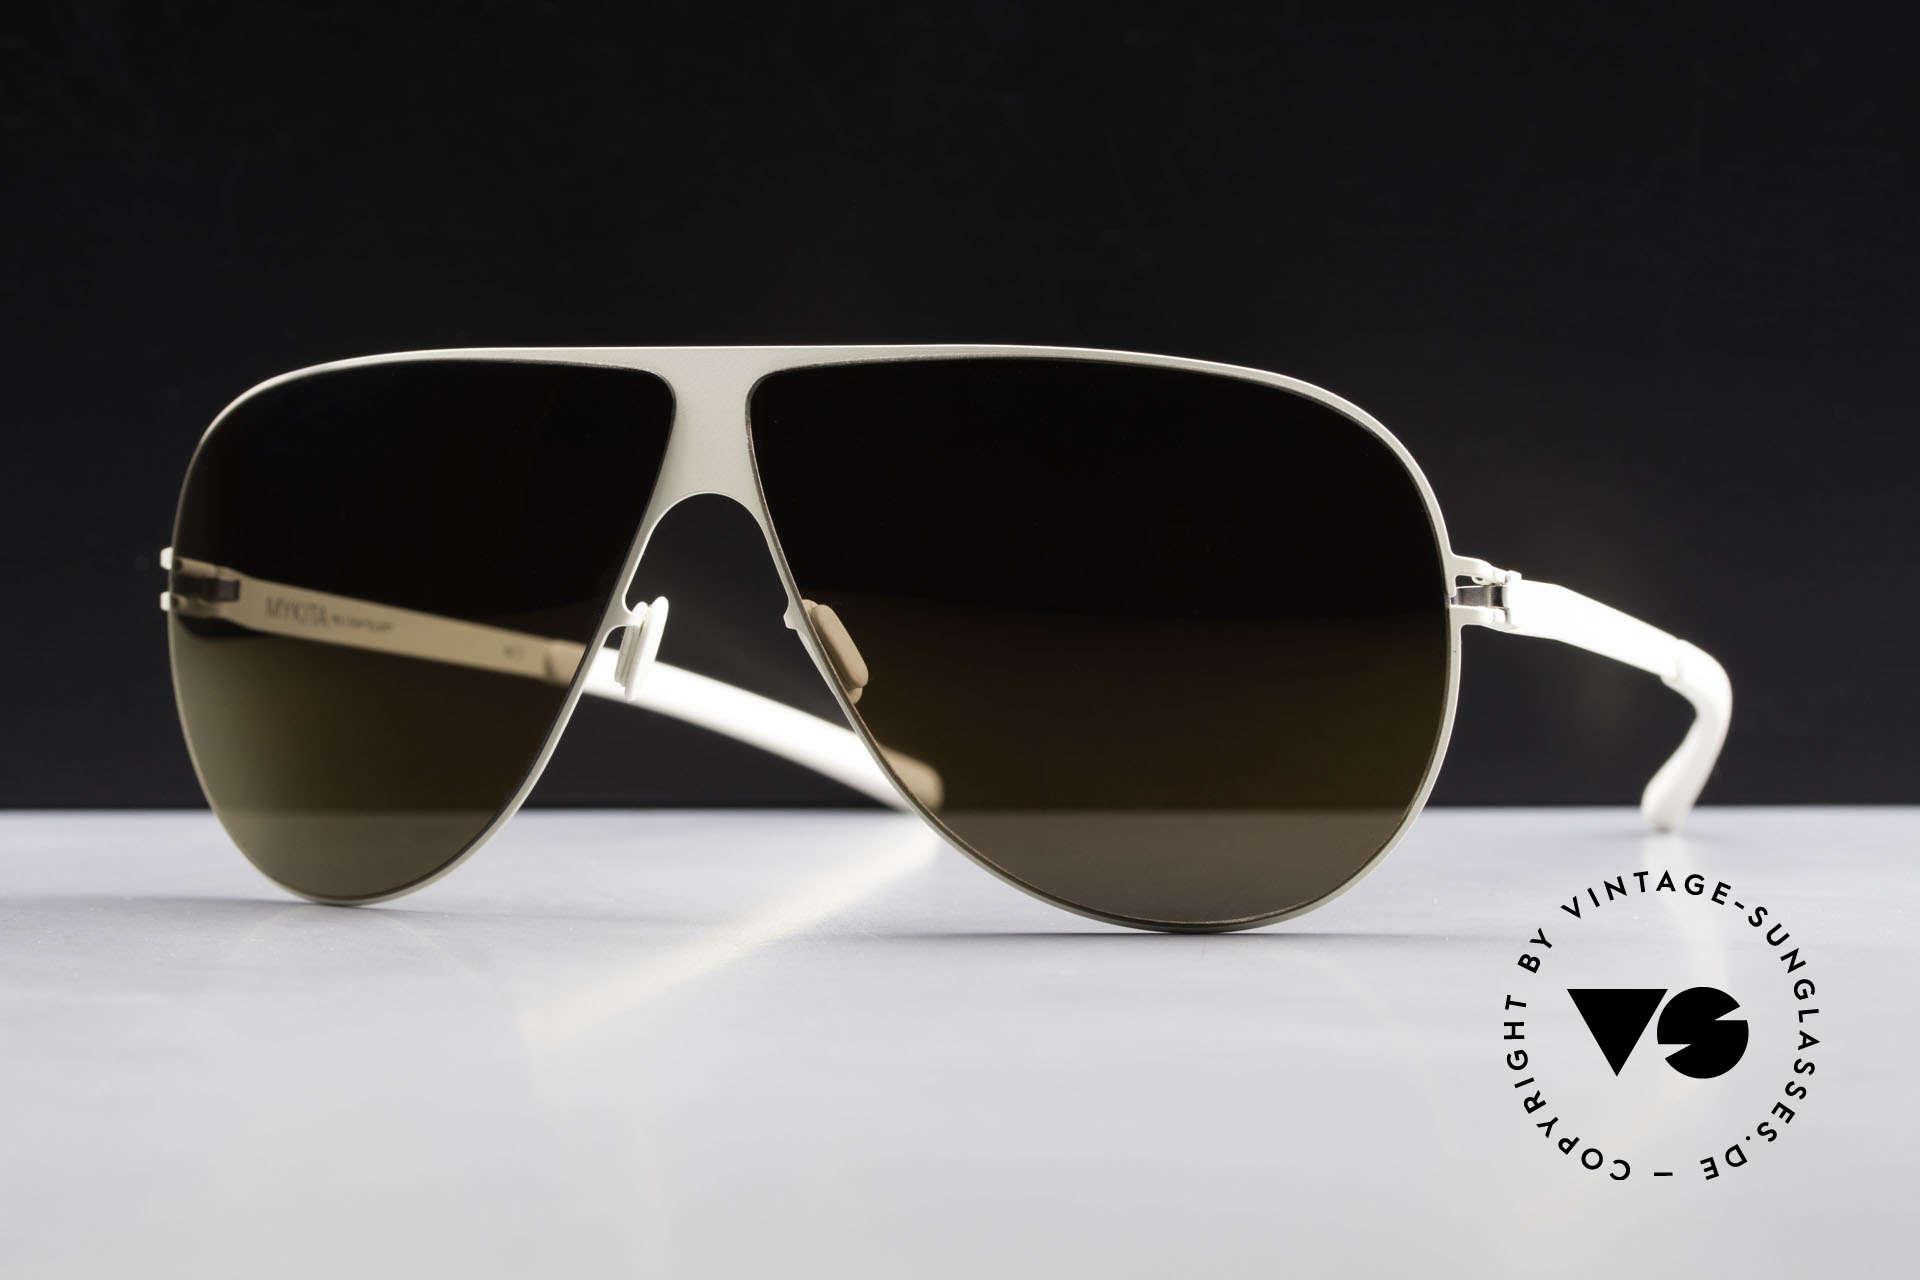 Mykita Elliot Tom Cruise Mykita Sonnenbrille, Model No.1 Sun Elliot Offwhite, brown-flash, Gr. 68/07, Passend für Herren